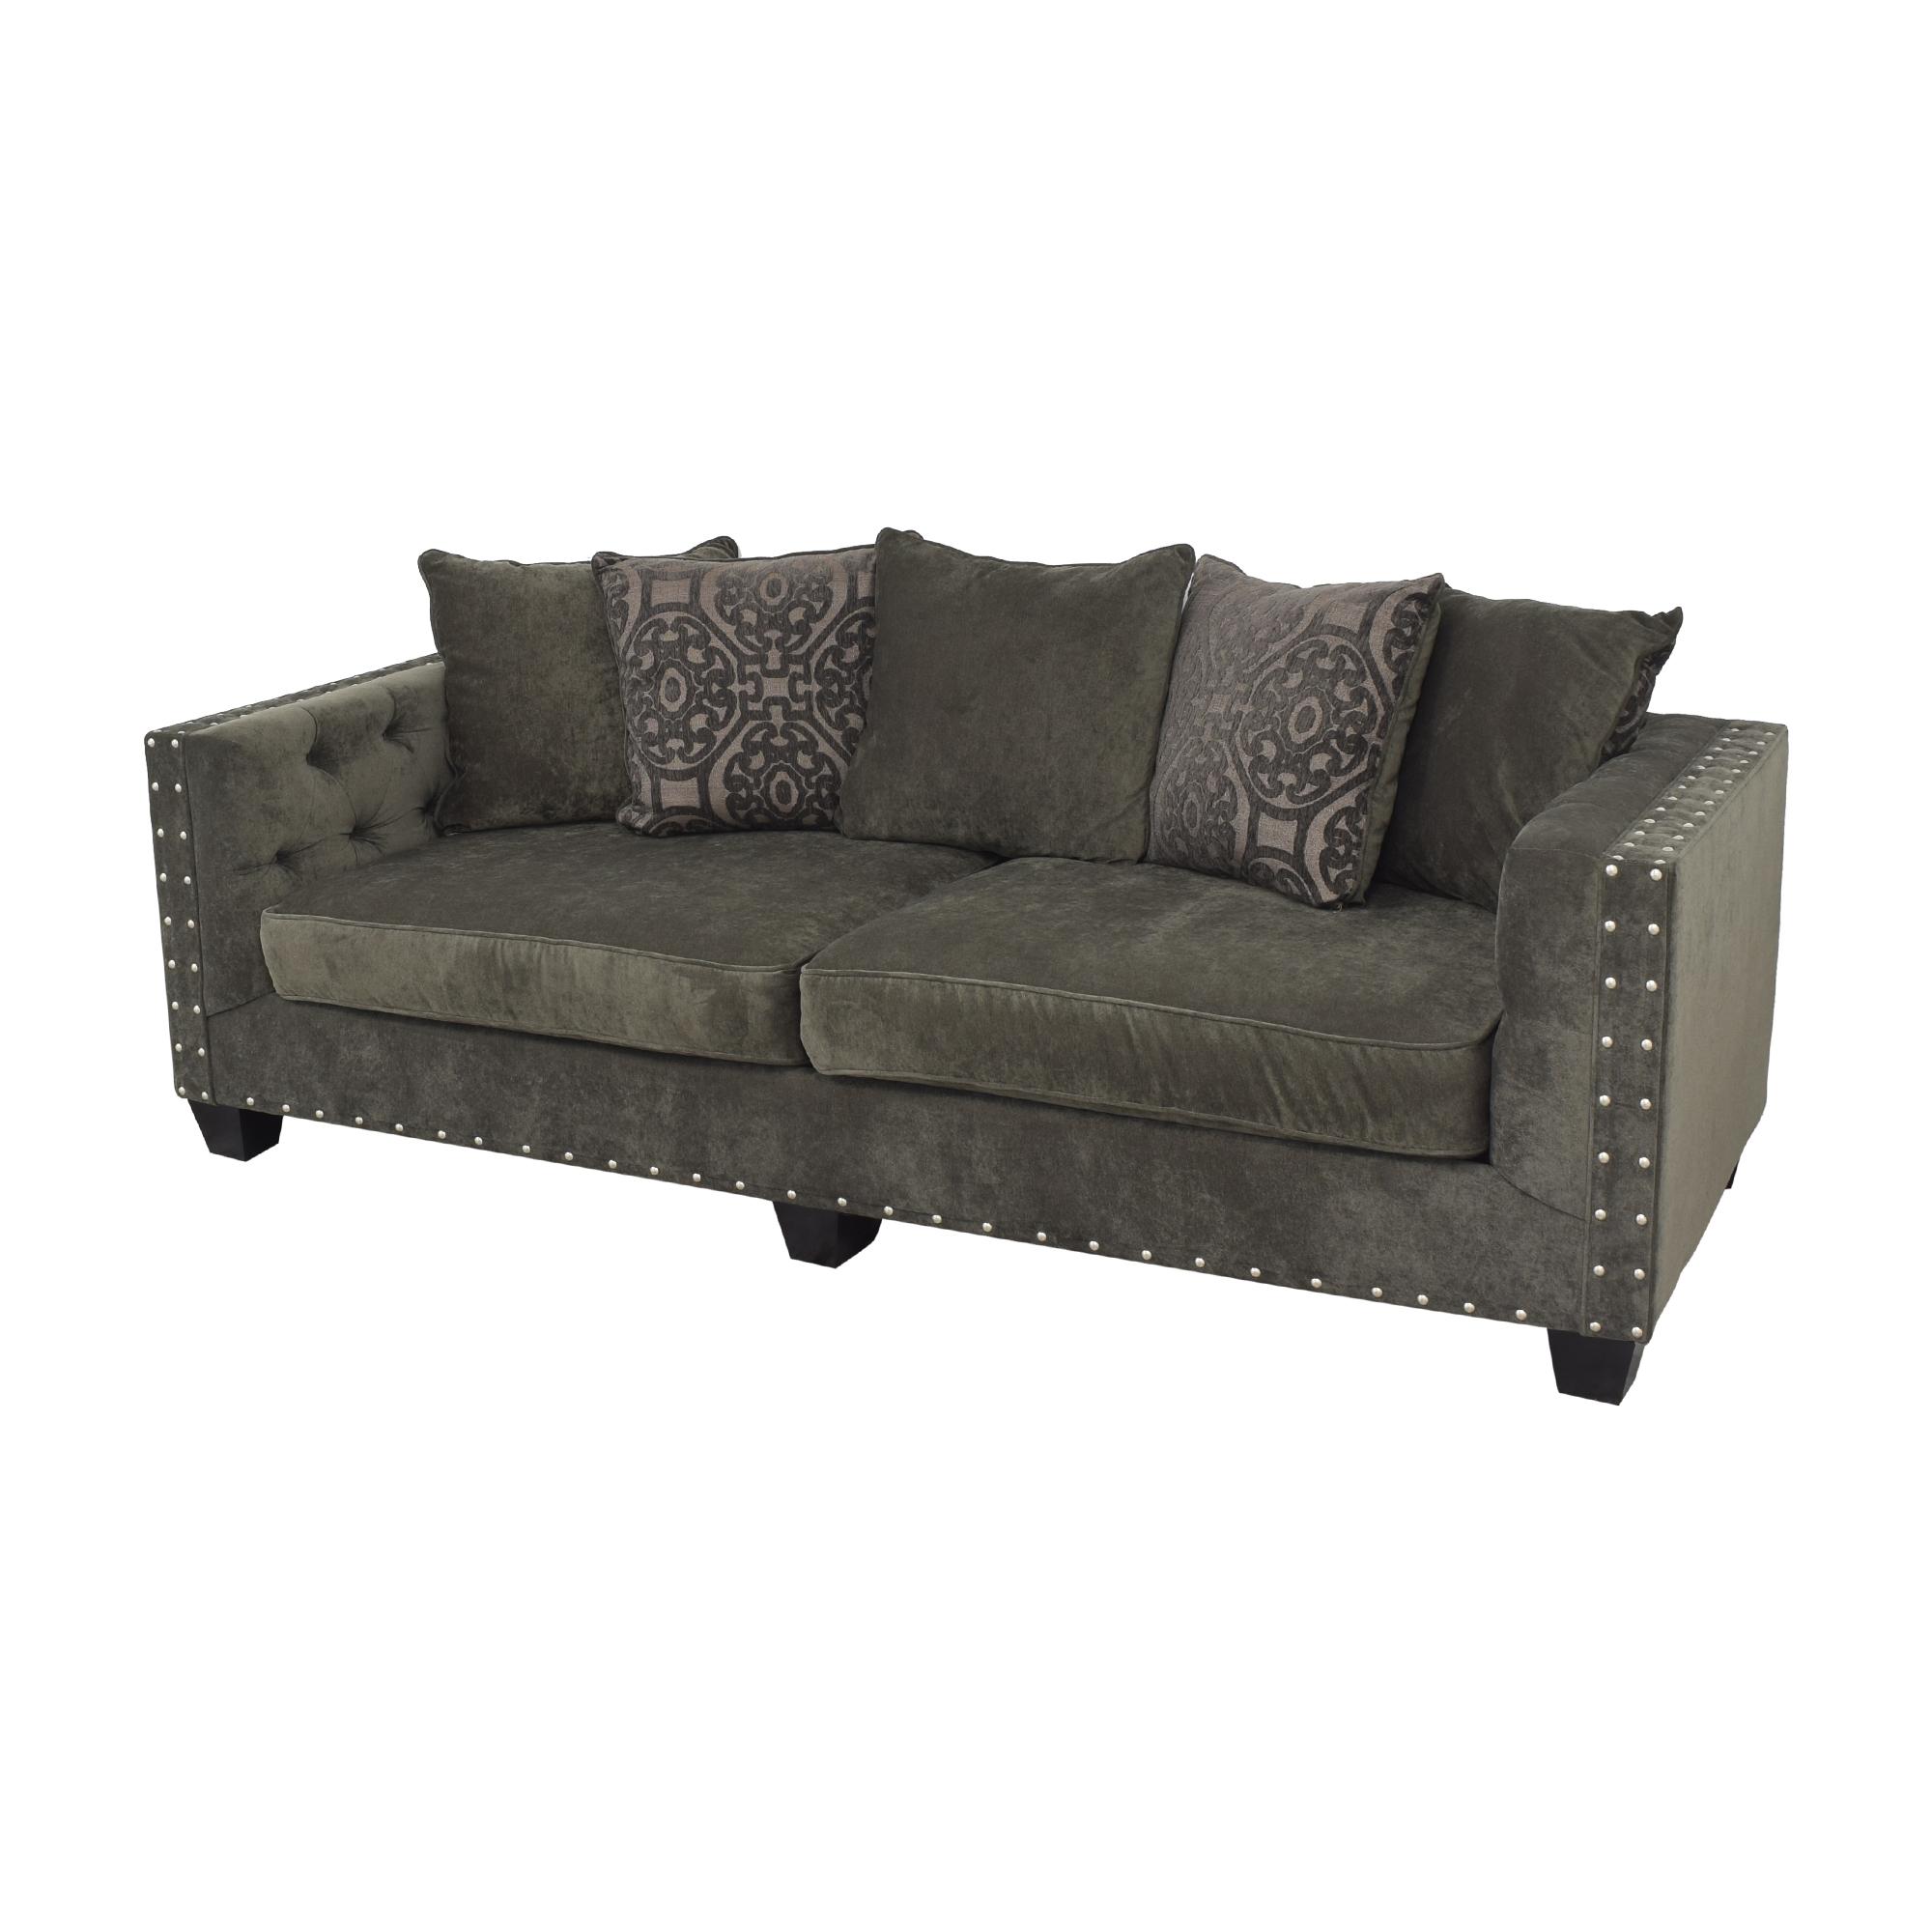 shop Cindy Crawford Home Cindy Crawford Calista Microfiber Sofa online